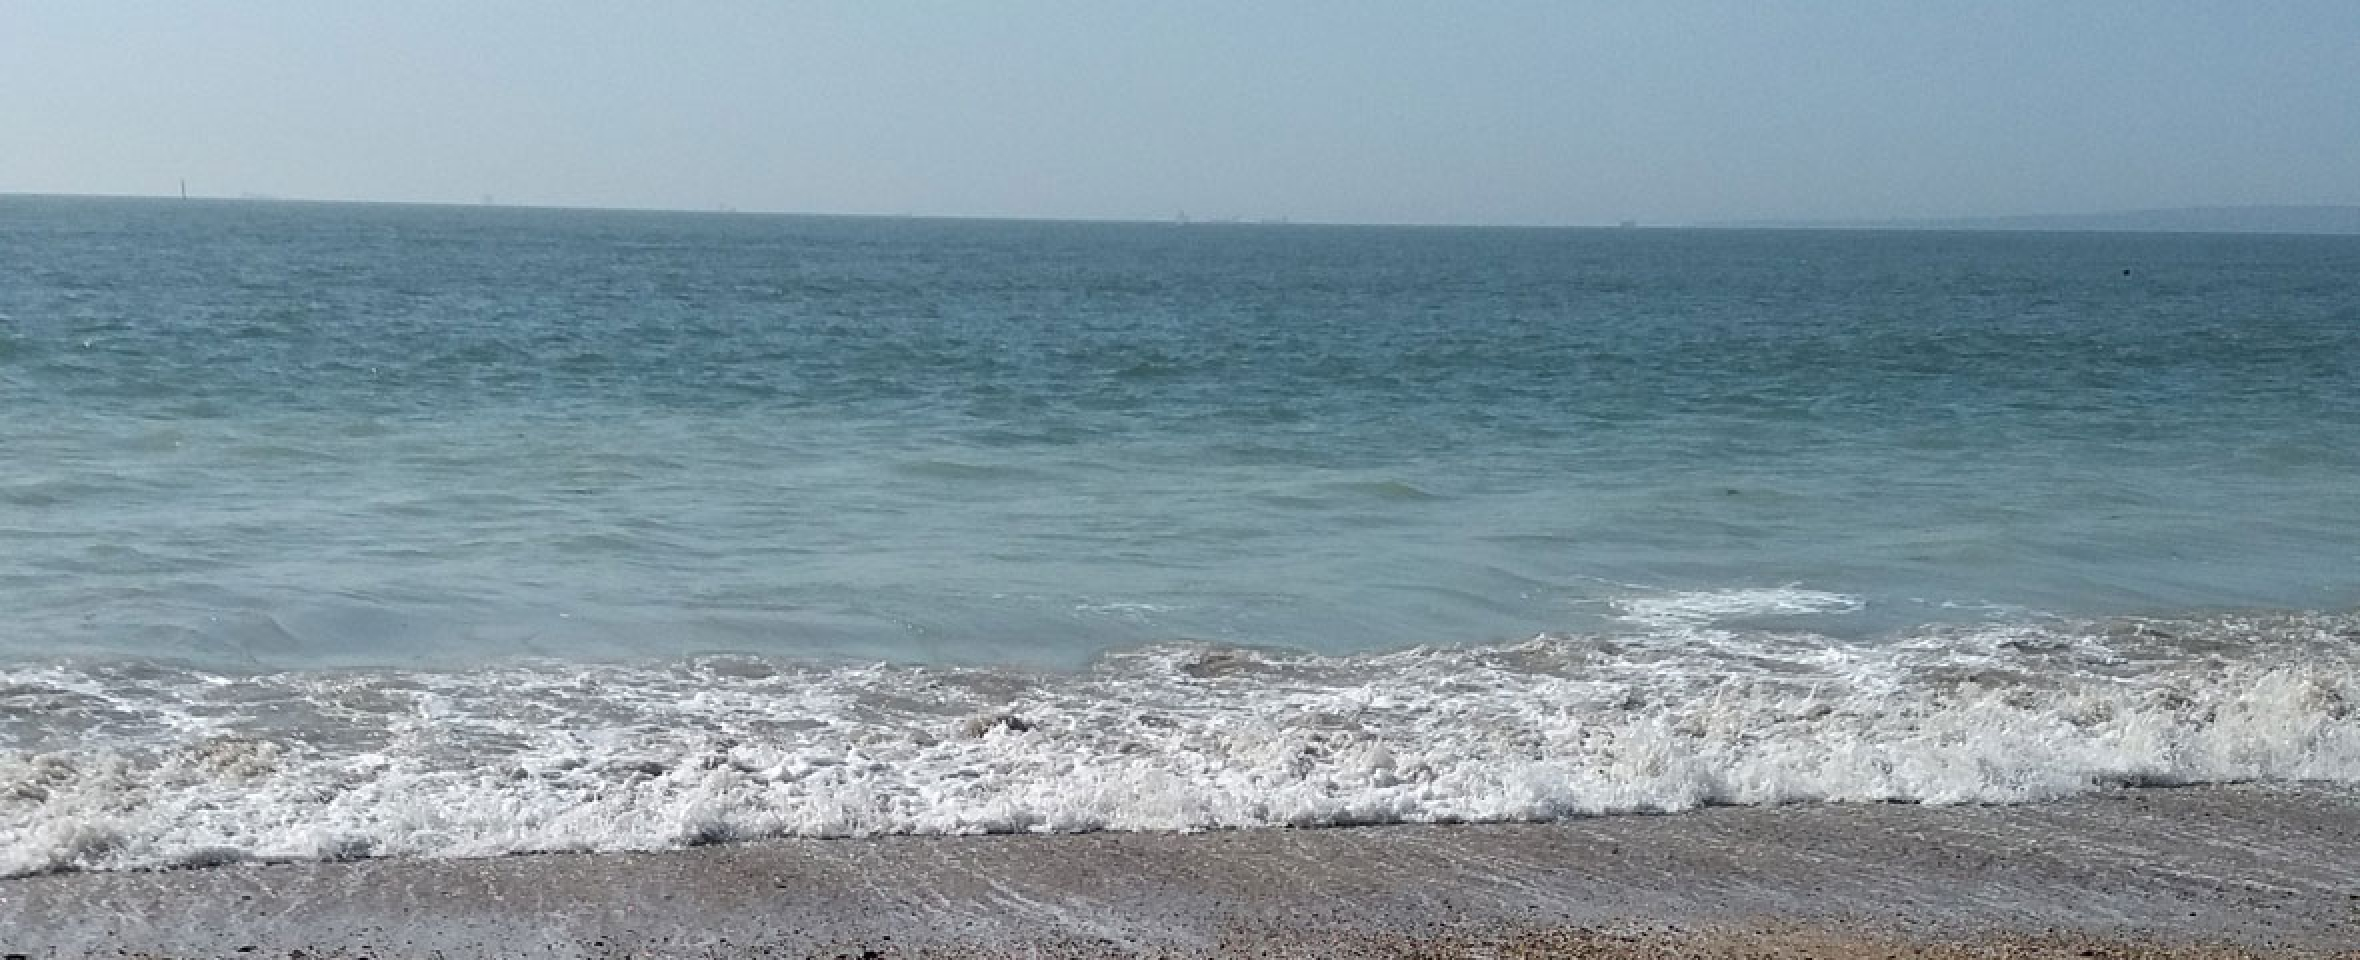 Southsea Beach in Portsmouth